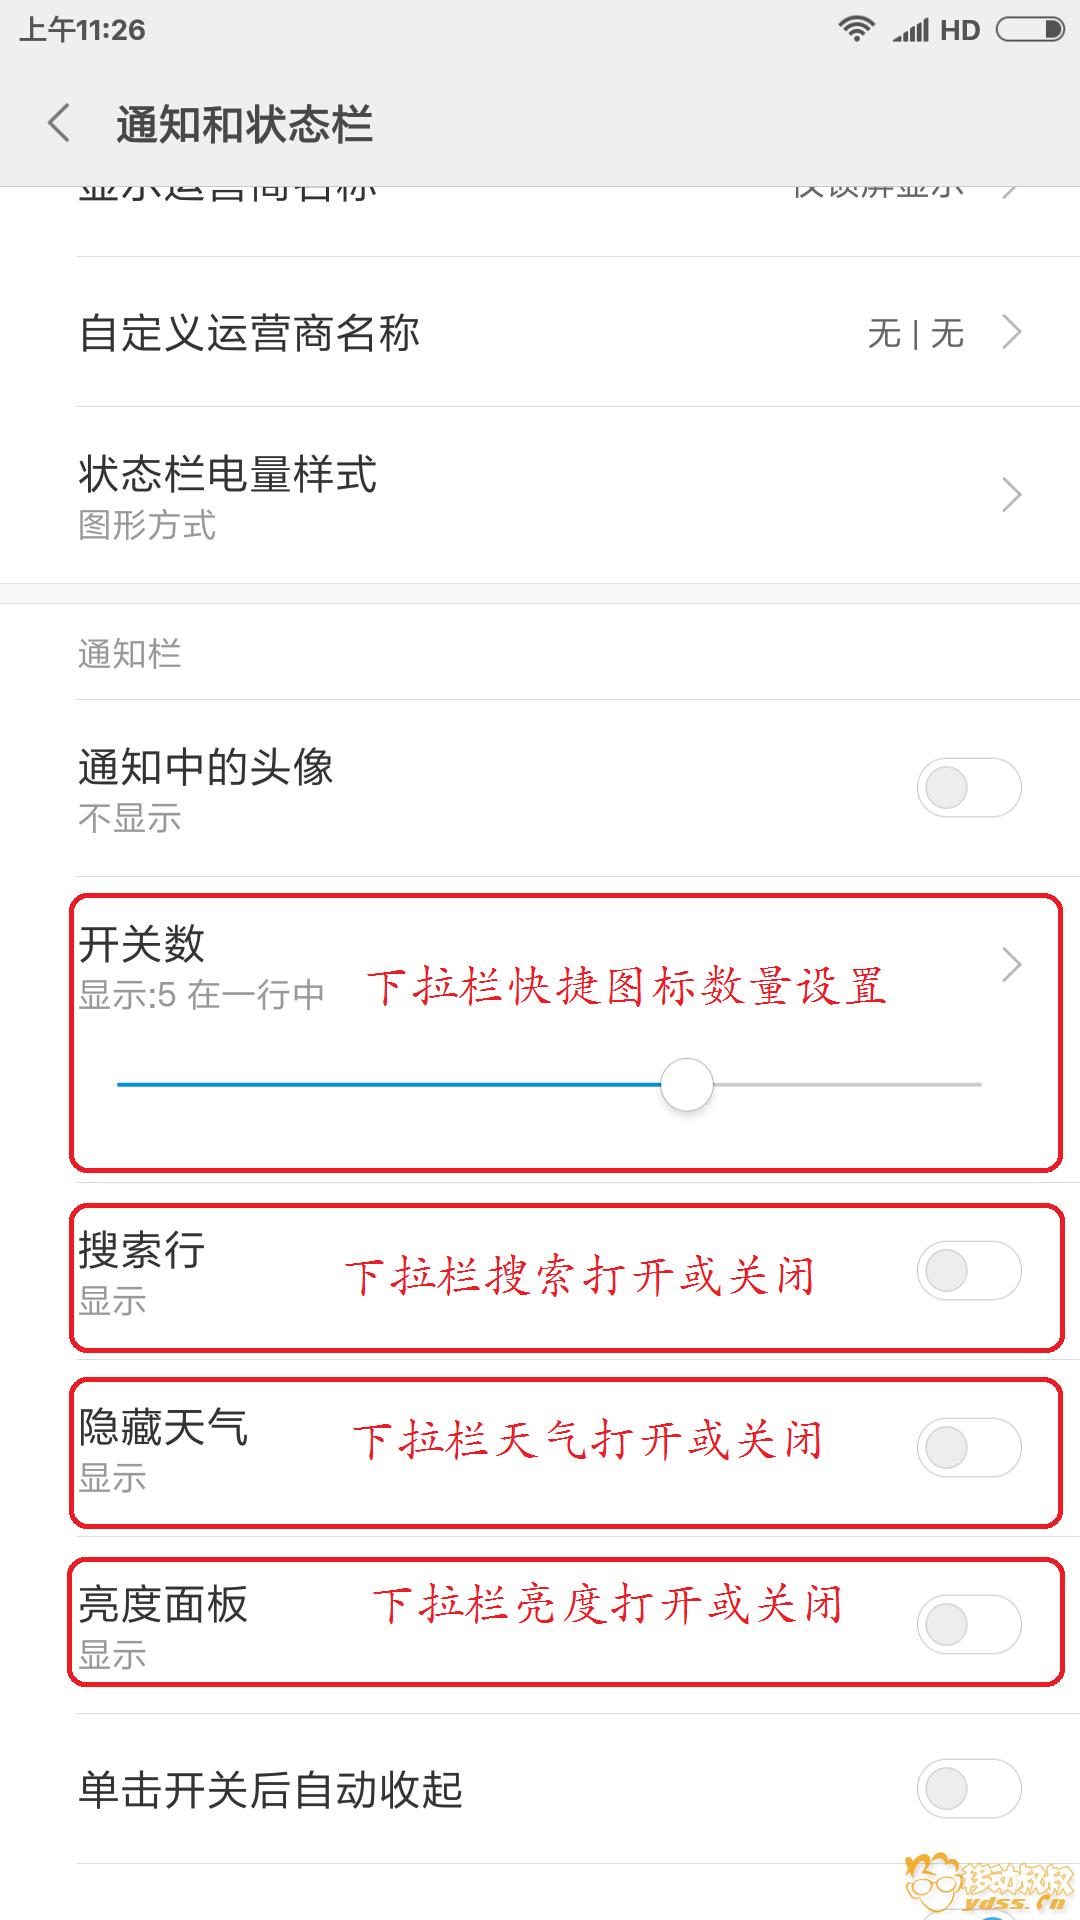 Screenshot_2018-05-04-11-26-52-689_com.android.settings.png